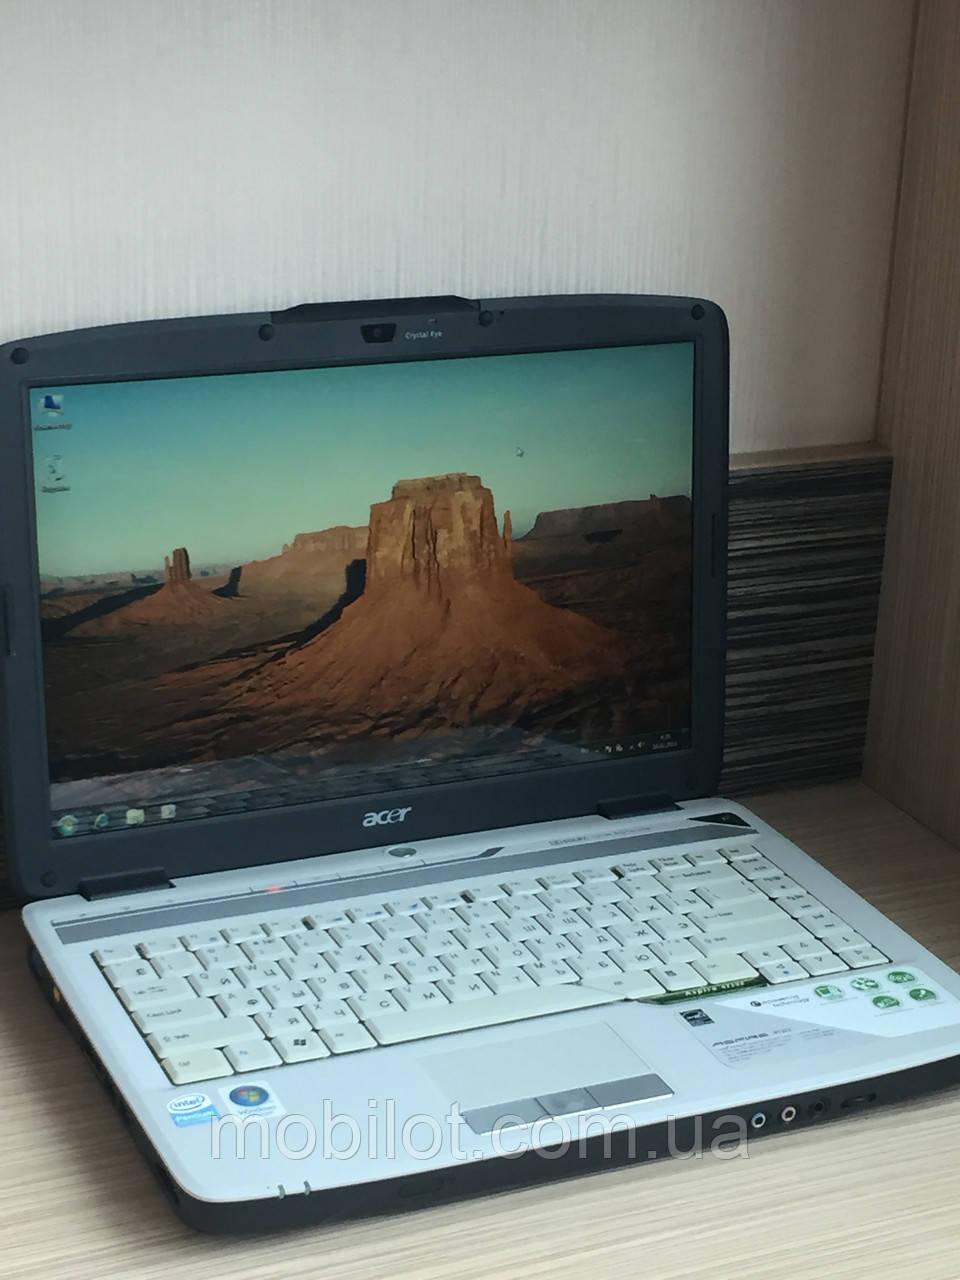 Ноутбук Acer Aspire 4720Z (NR-2547)